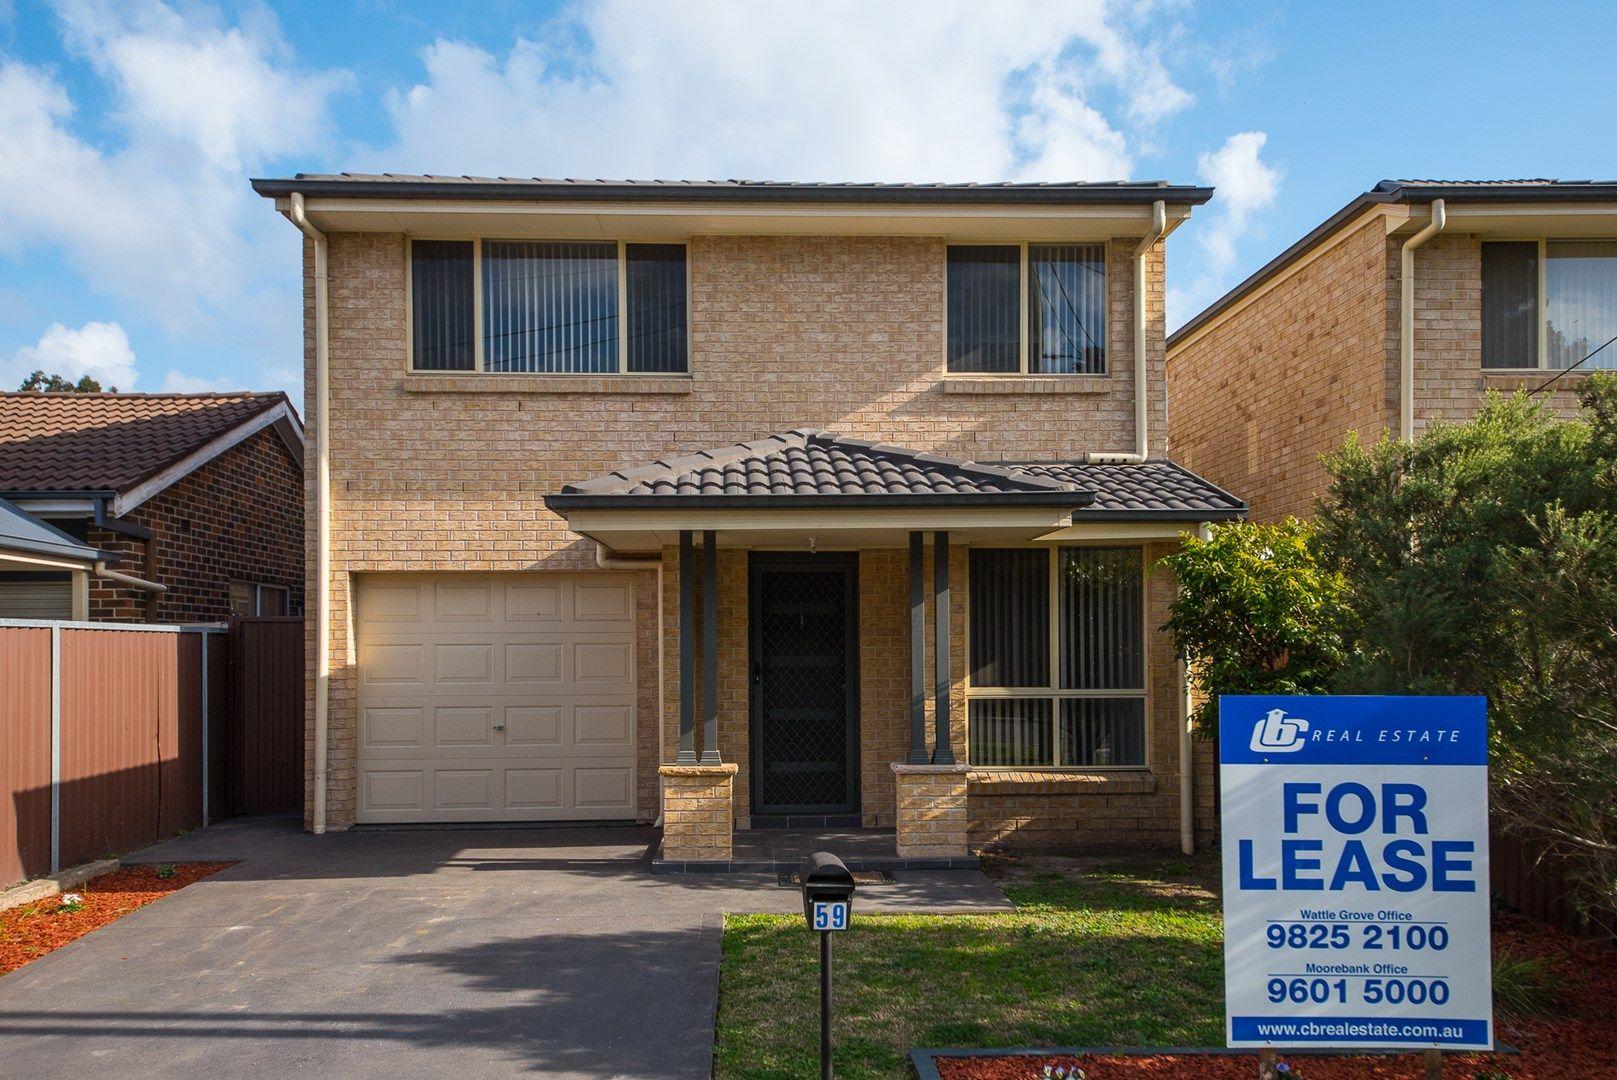 59 Cooper  Street, Moorebank NSW 2170, Image 0